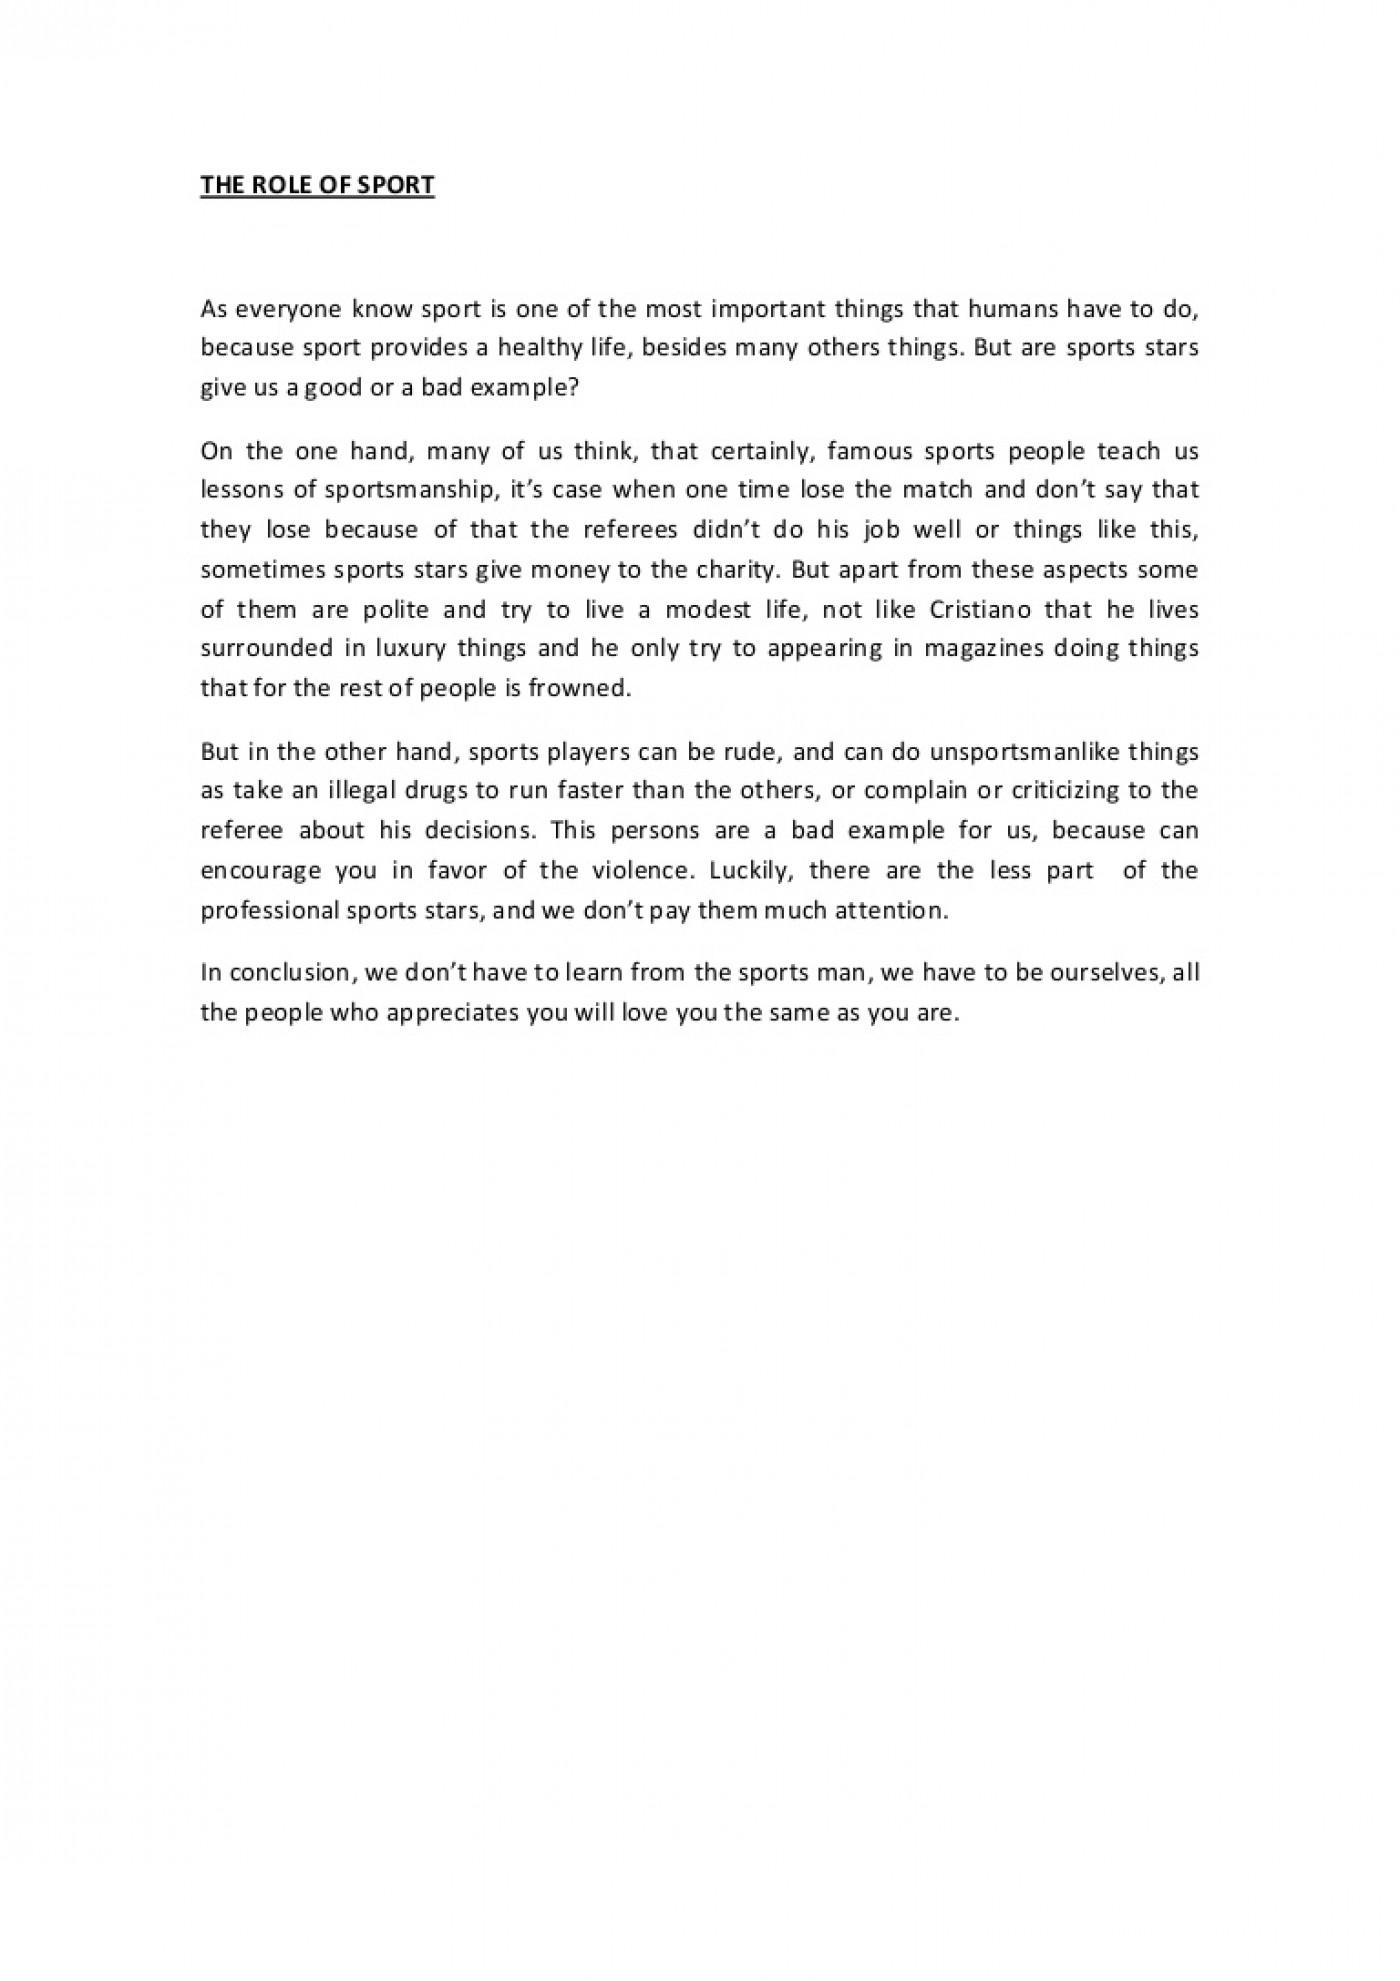 009 Write My Top Argumentative Essay On Shakespeare